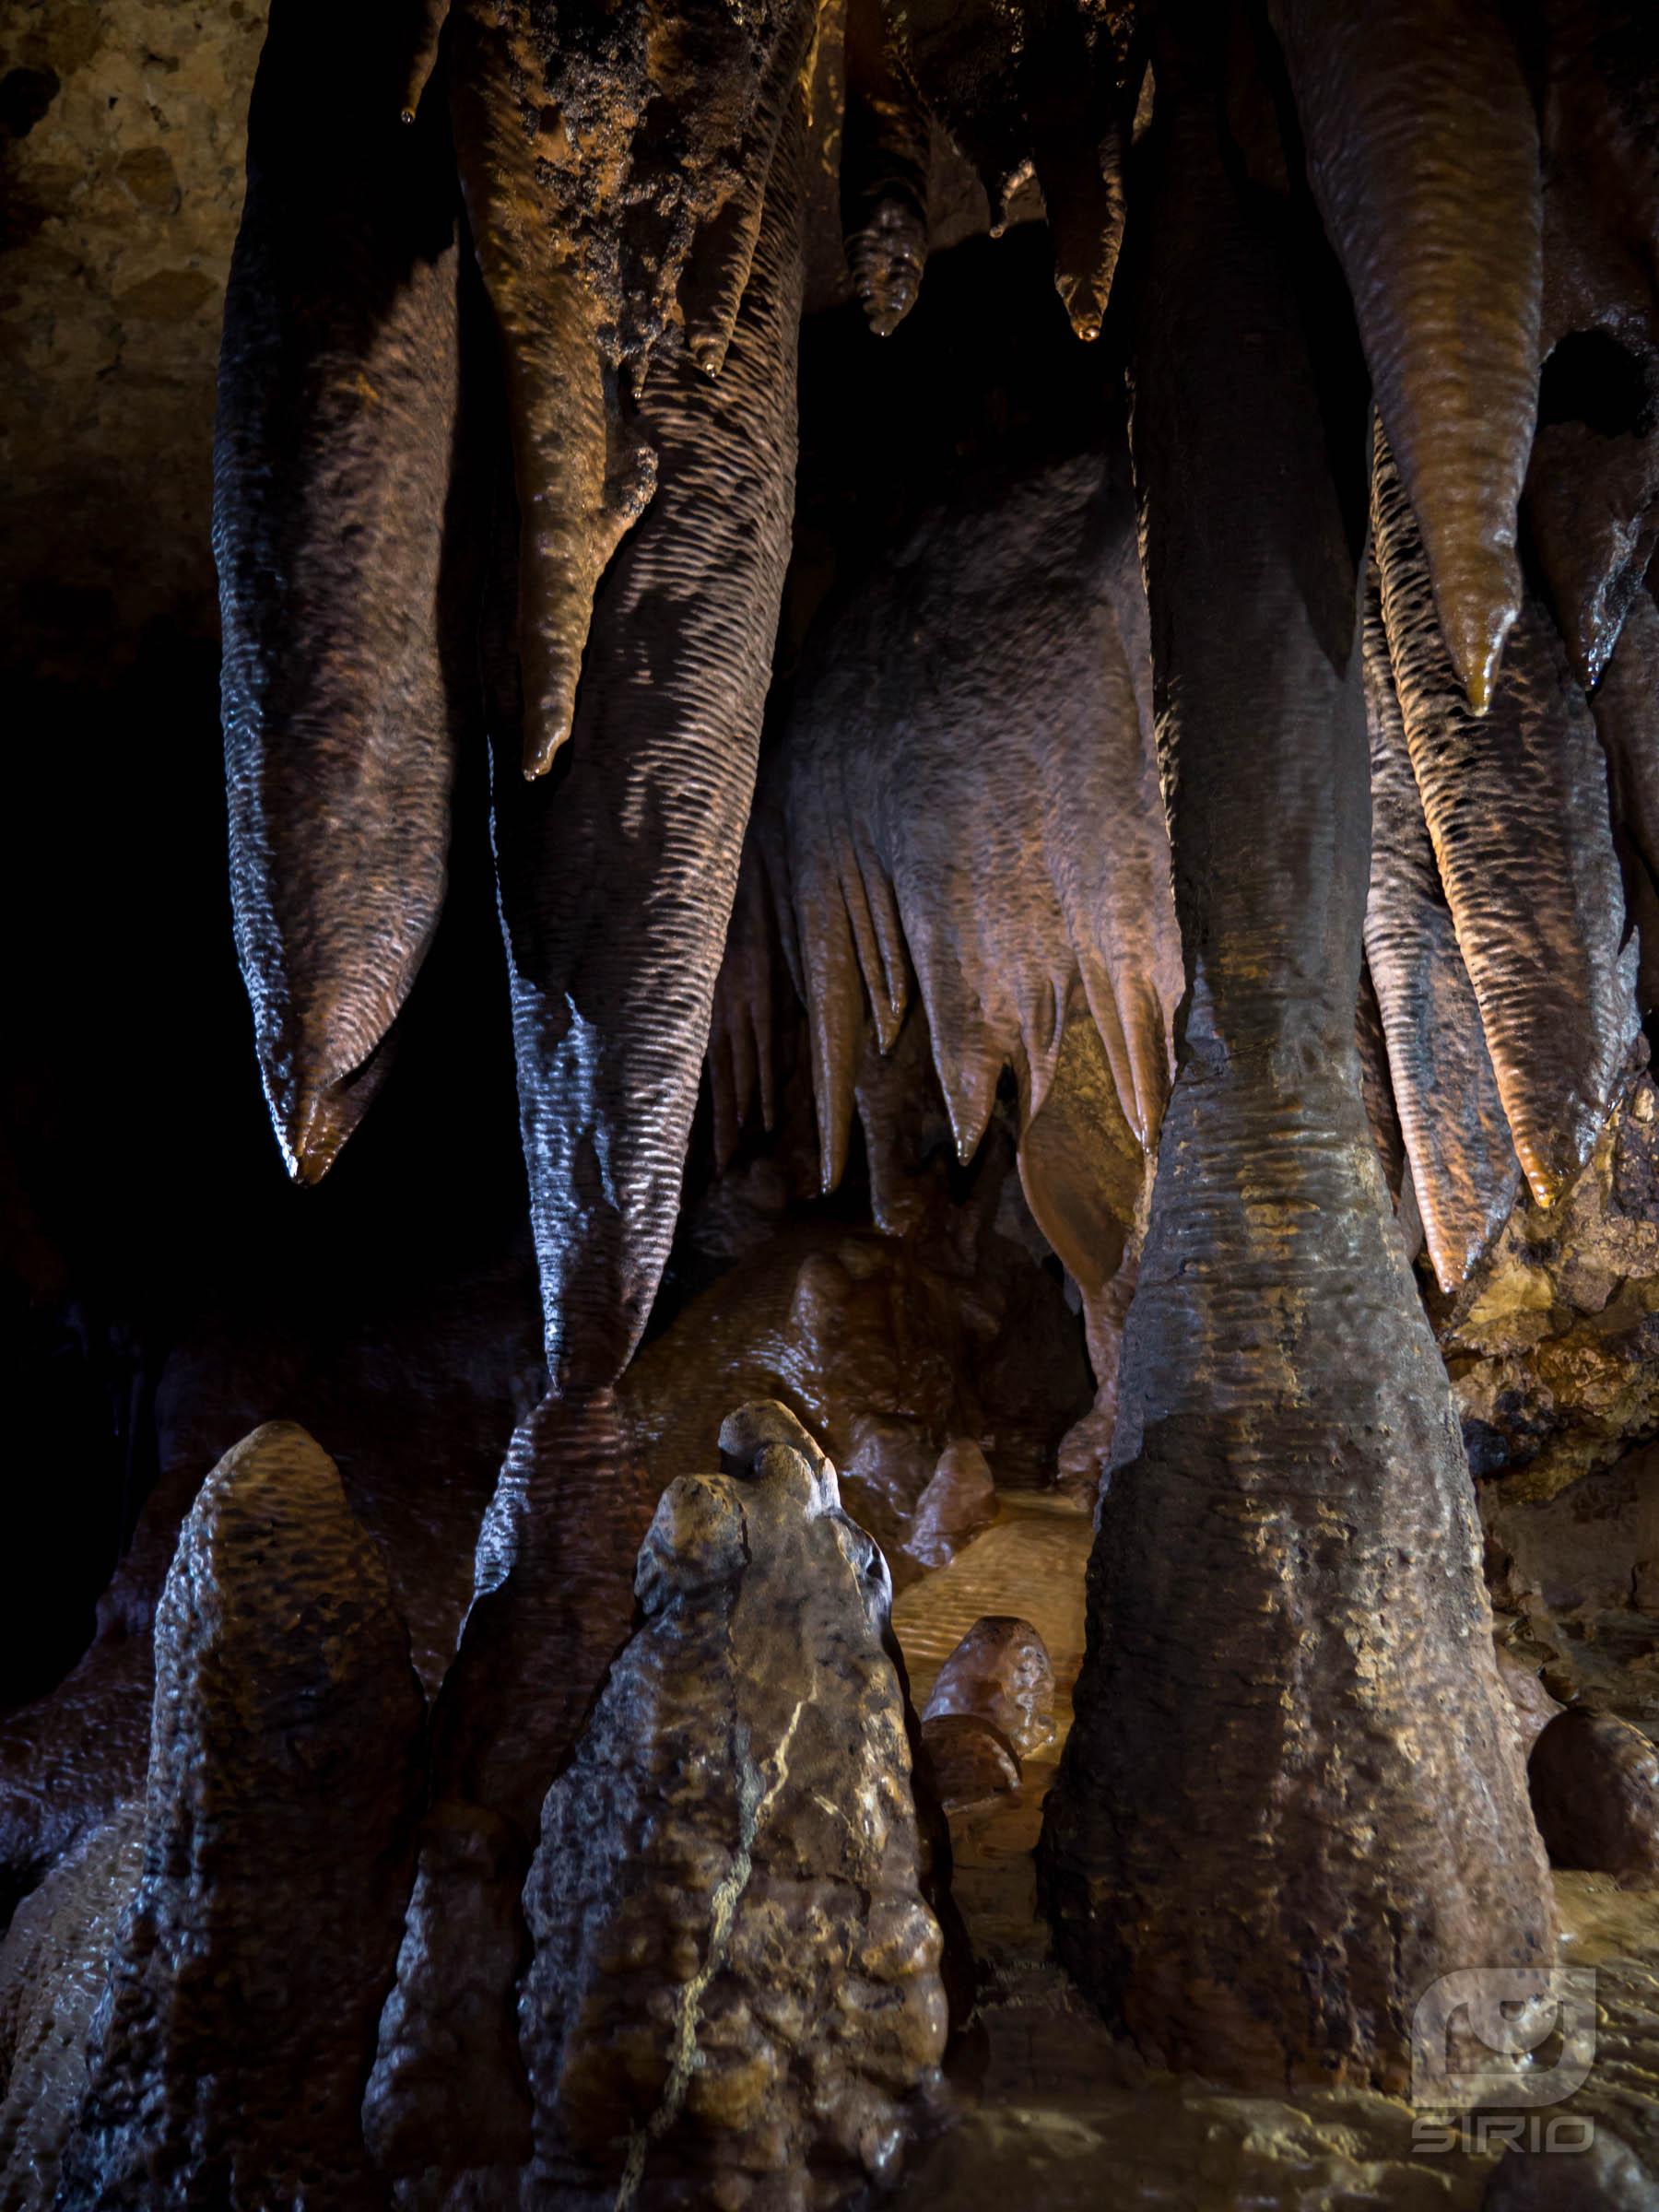 Stalagmite and stalactite.